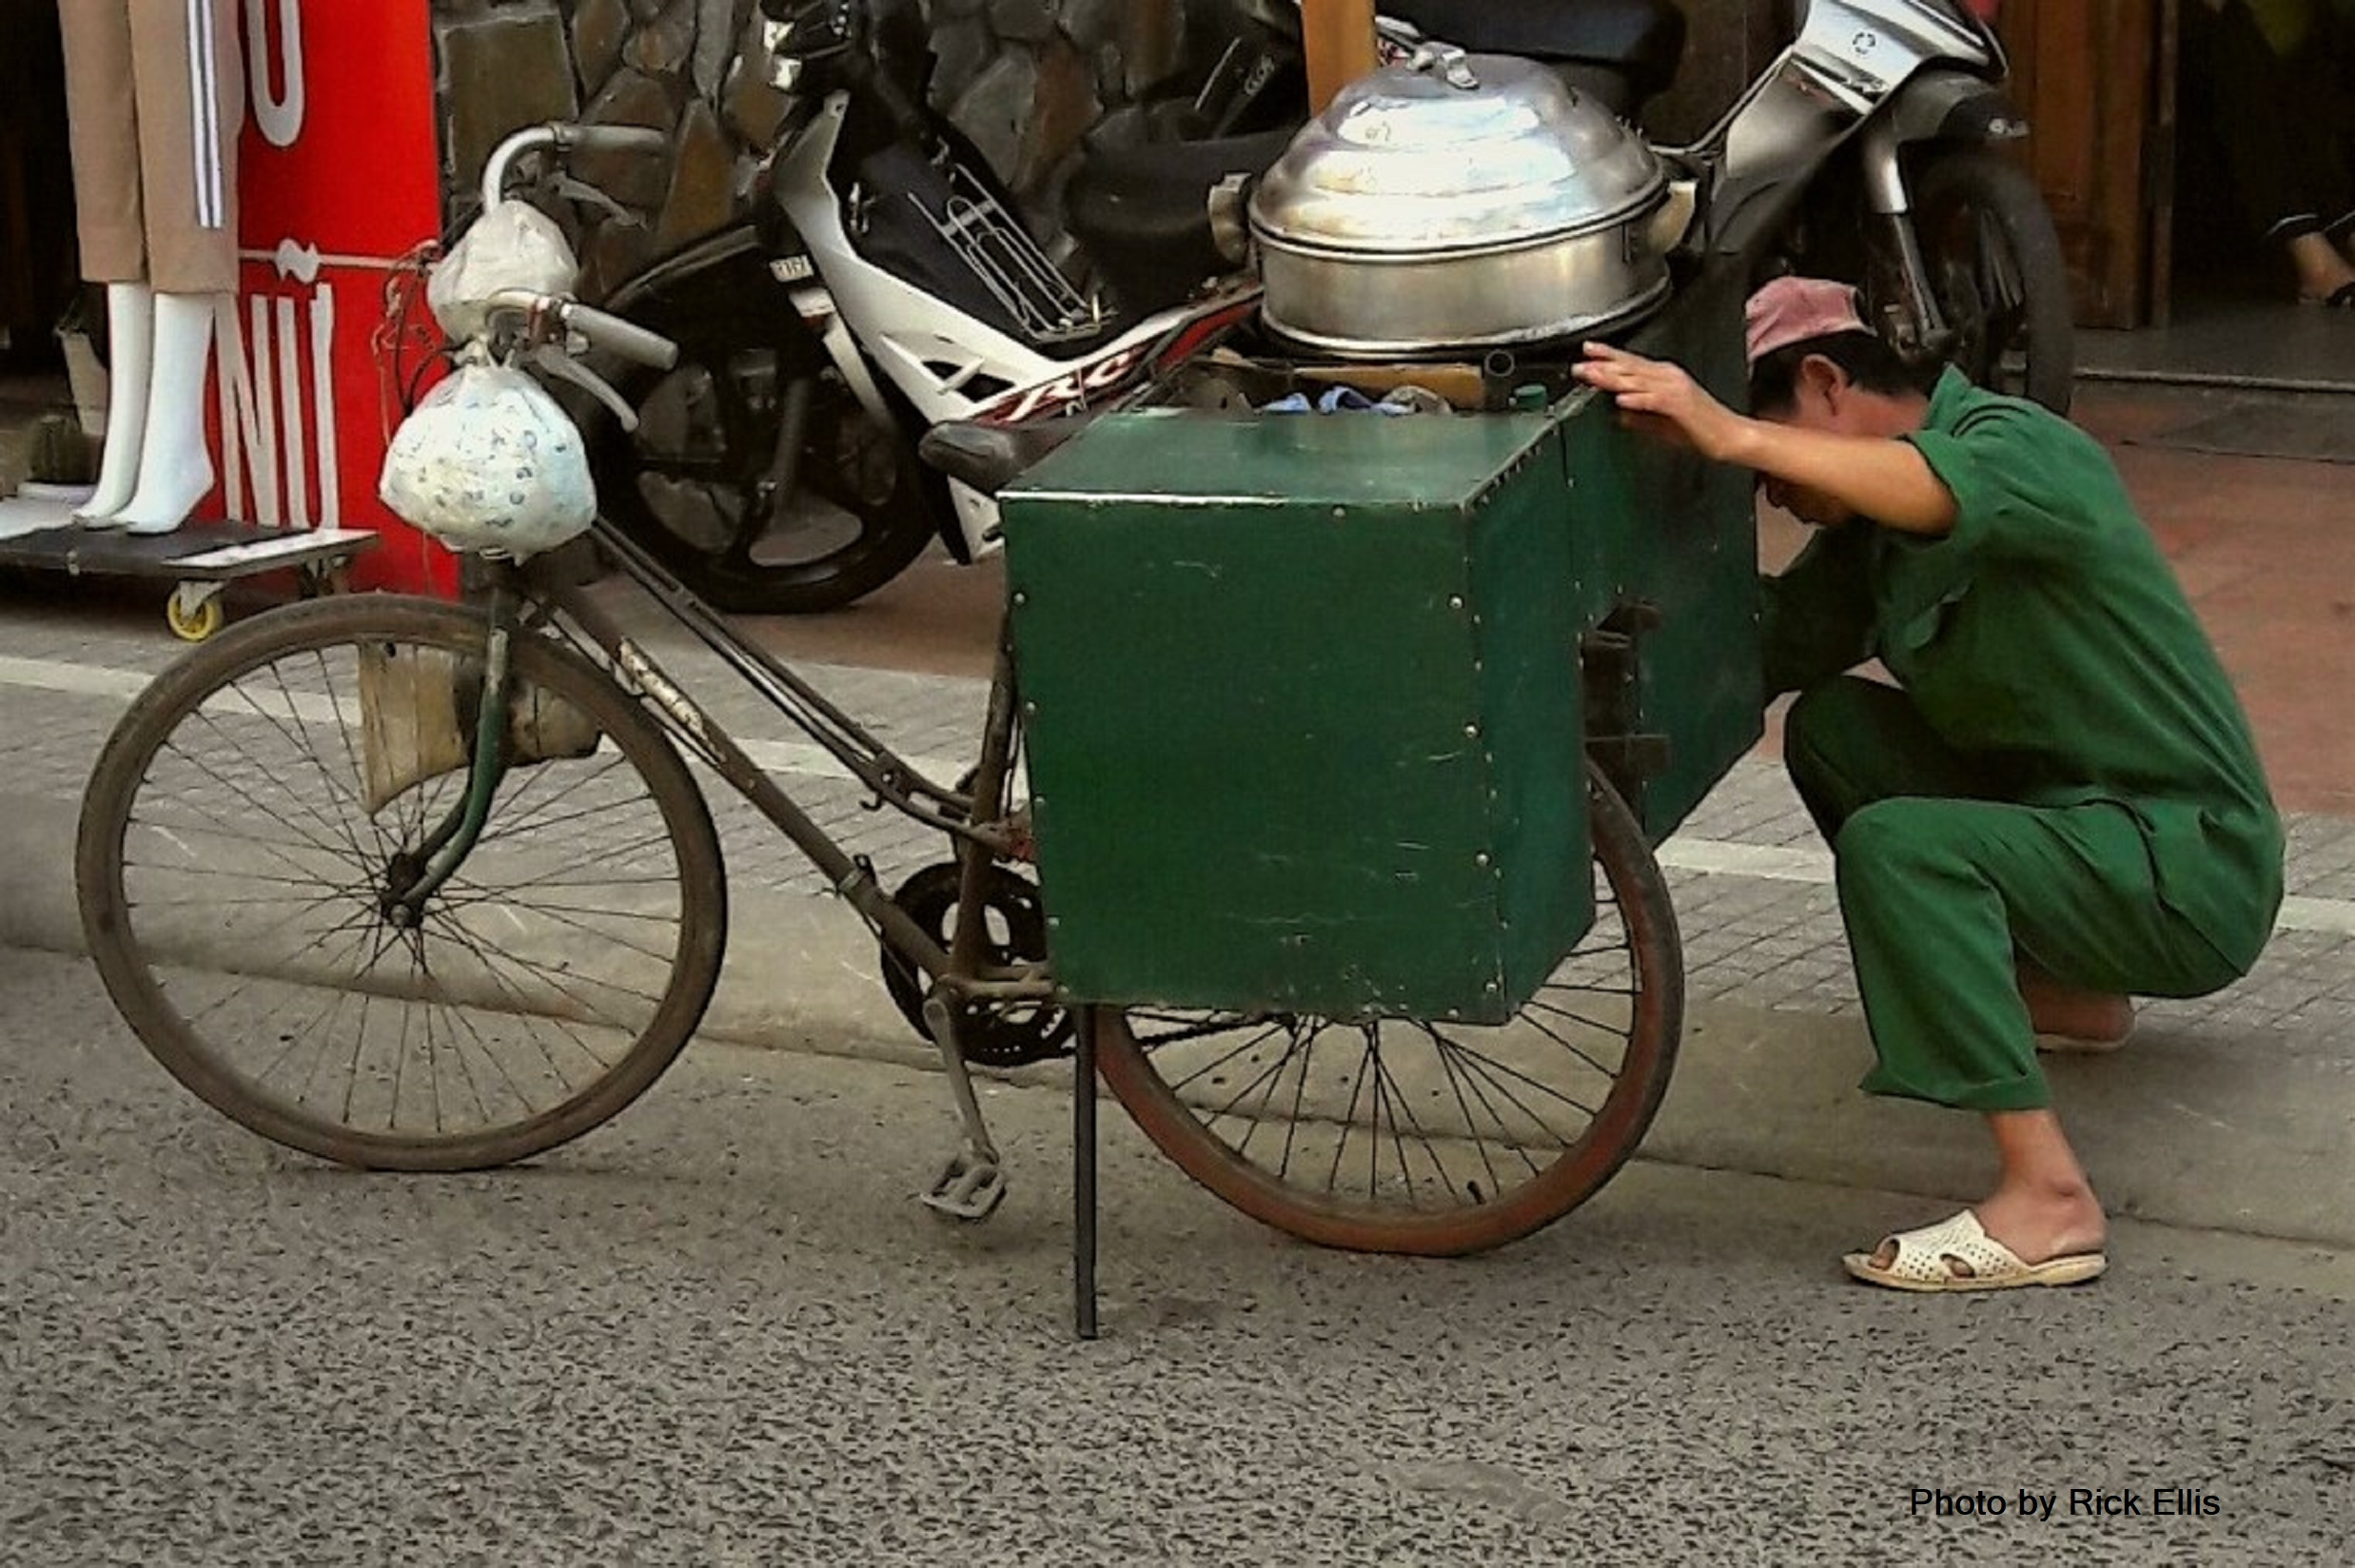 Bánh bao <em>man tuning up his rig</em>